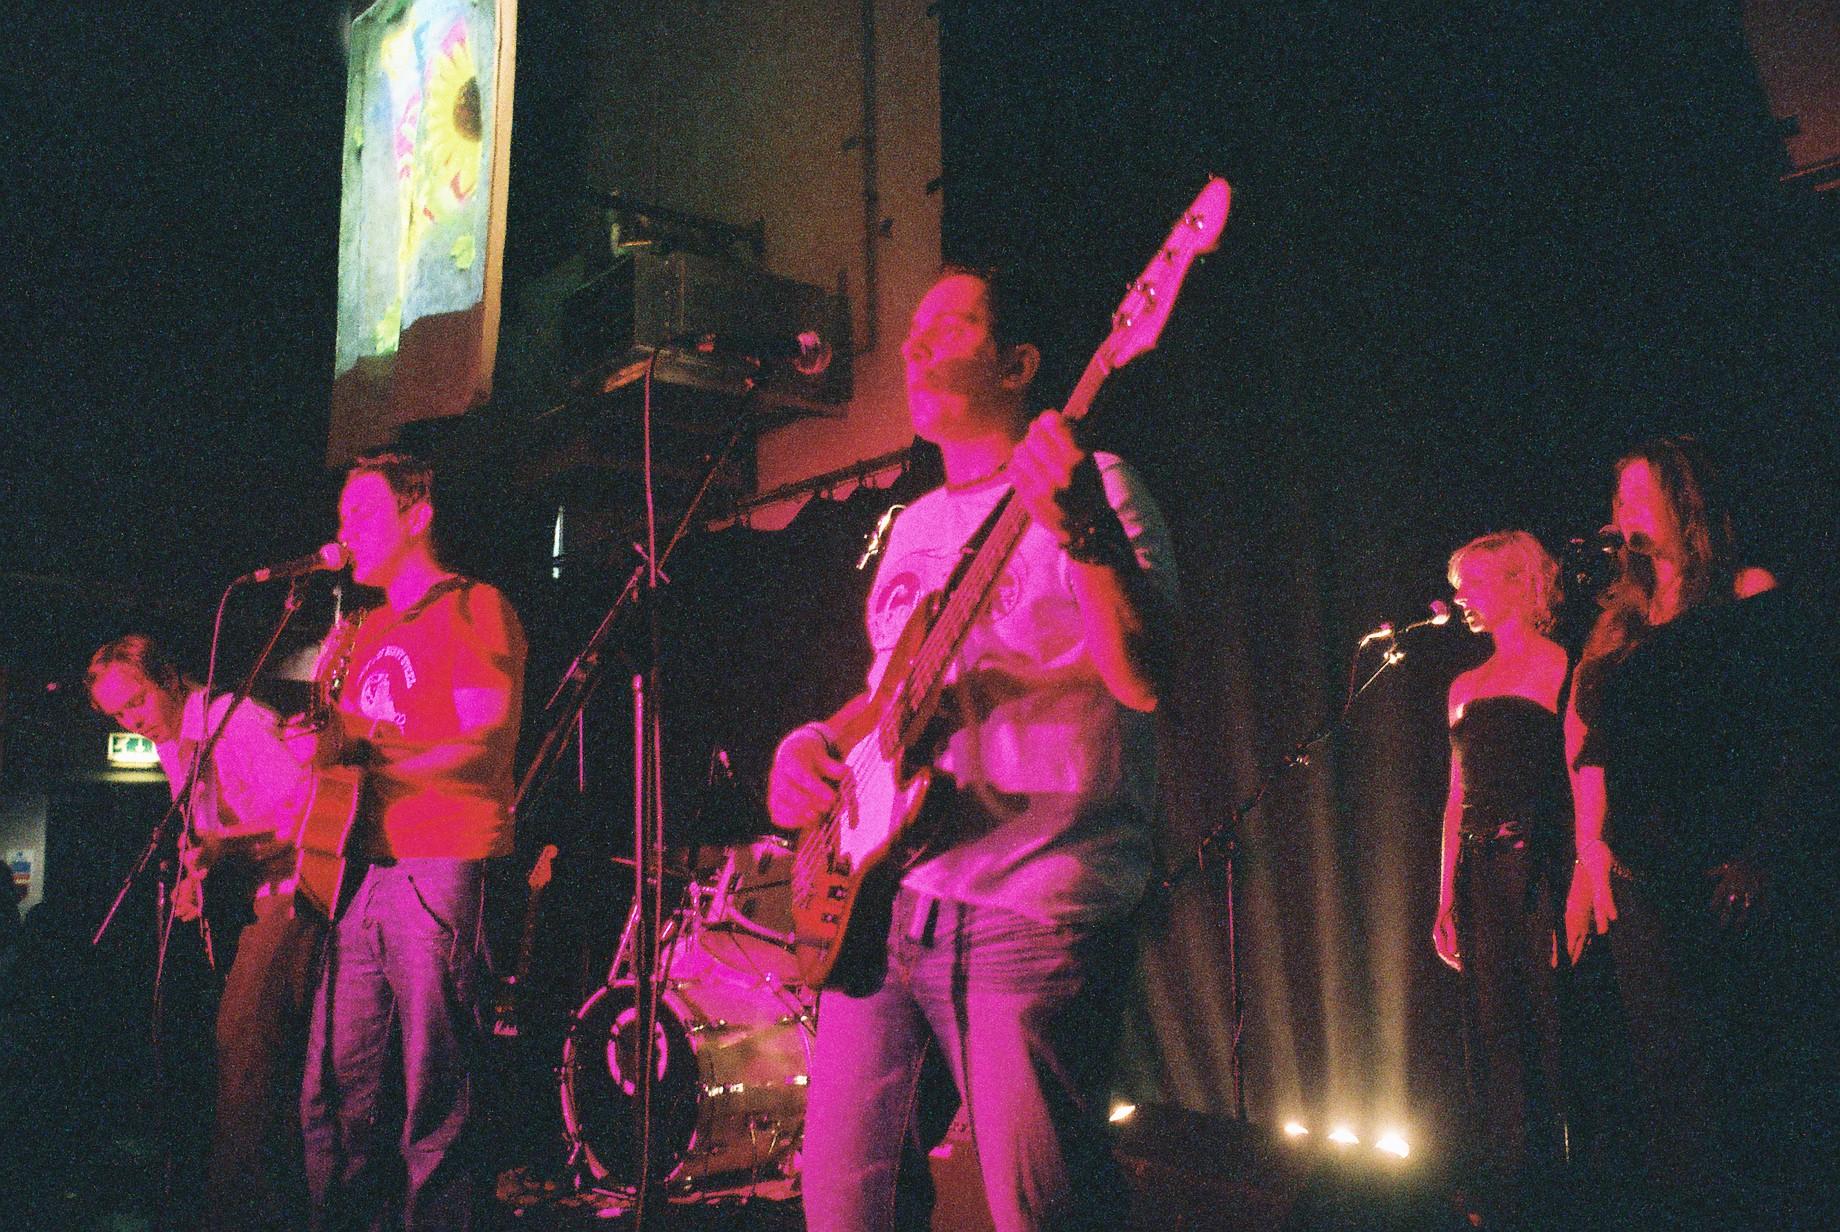 The Dees - Showcase - Union Chapel 2004, Islington